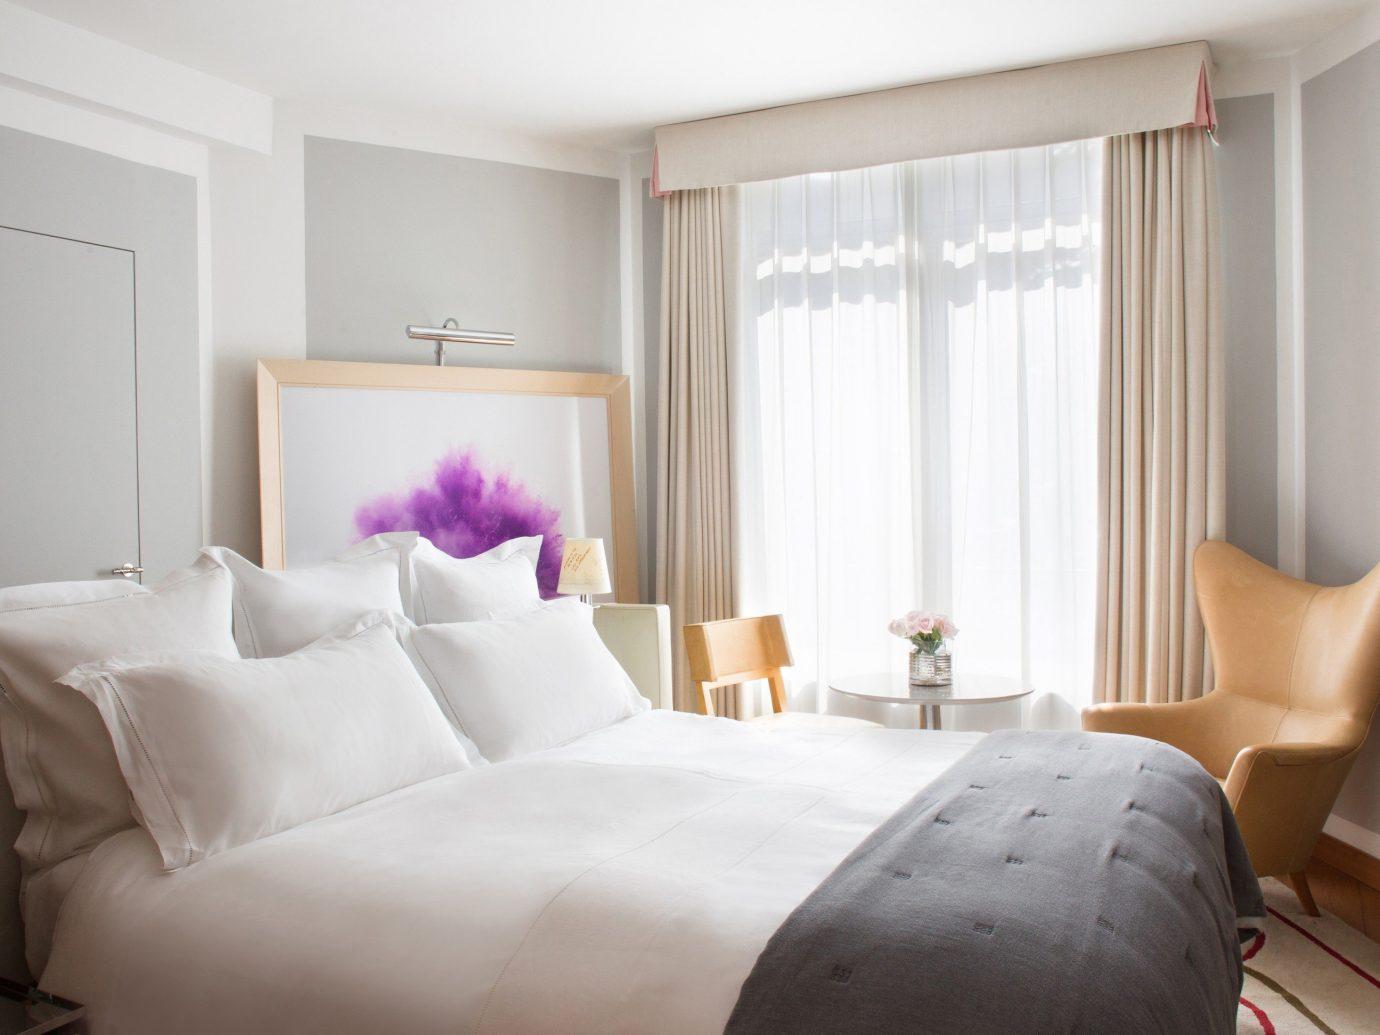 Hotels indoor wall bed room Bedroom property window ceiling Suite interior design home living room hotel cottage real estate estate apartment bed sheet furniture